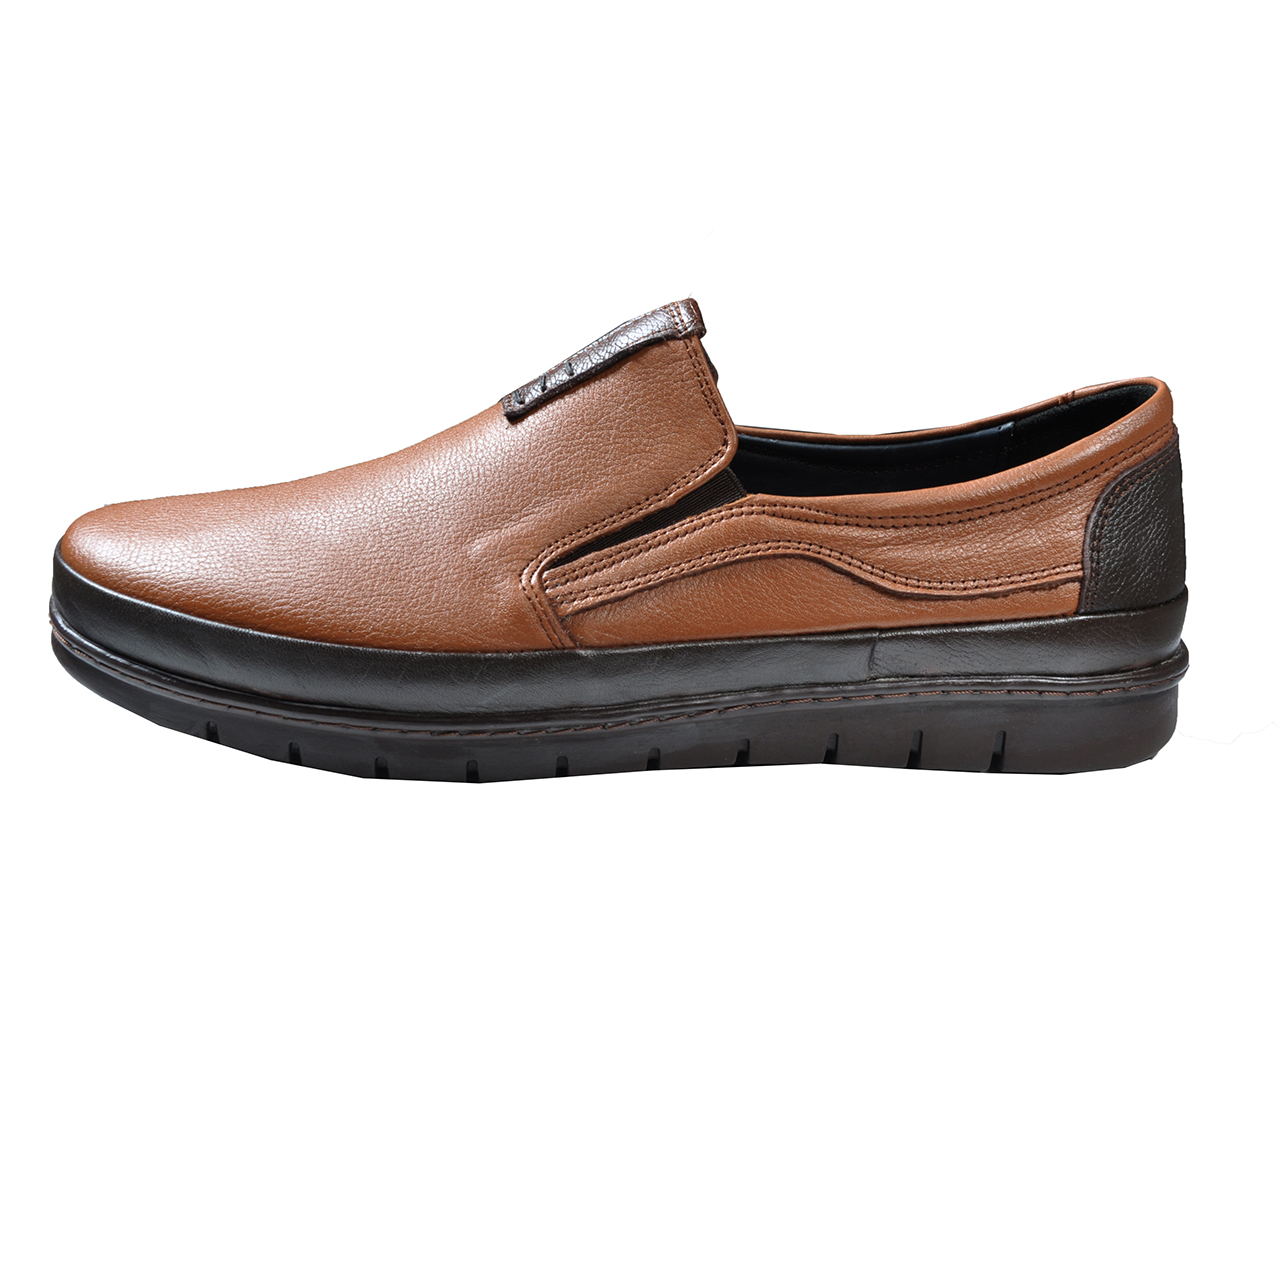 کفش طبی مردانه مدل m100a